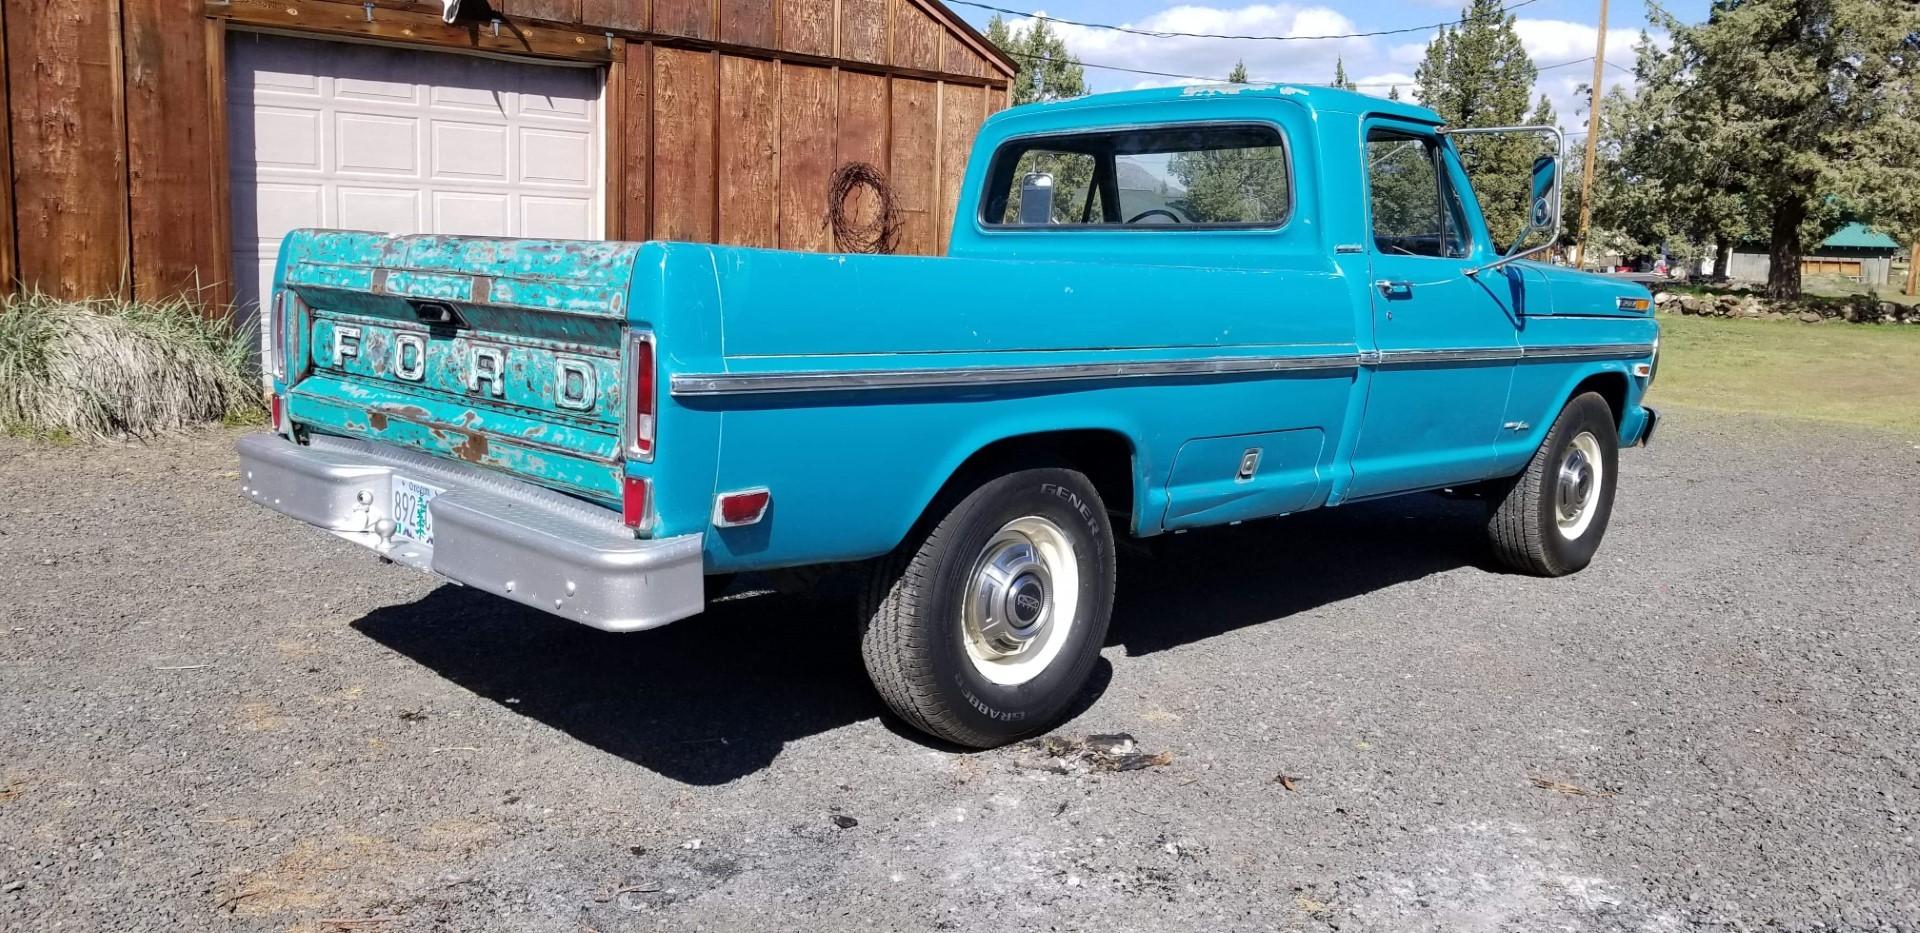 1969-Ford-F250-Custom-Cab-Camper-Special-360ci-V8-14